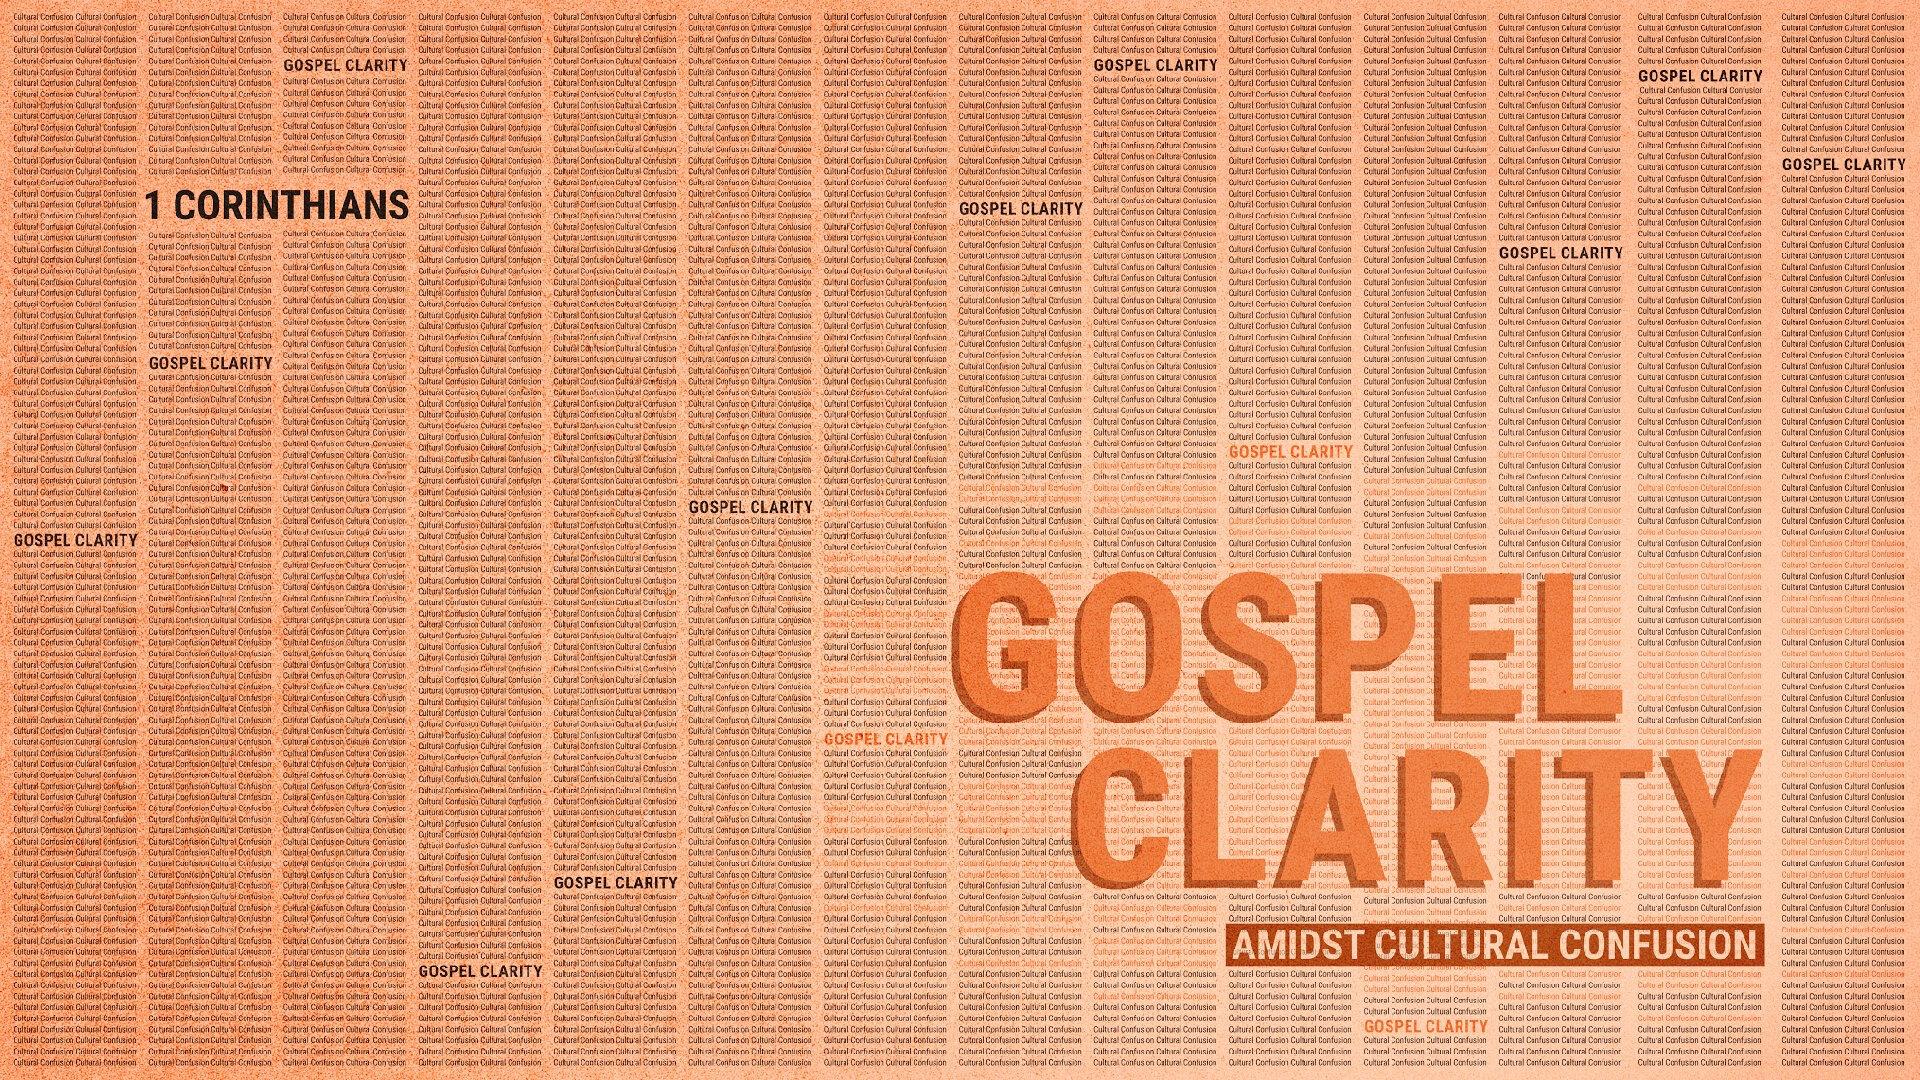 1Corinthians—GospelClarity 1920x1080.jpg